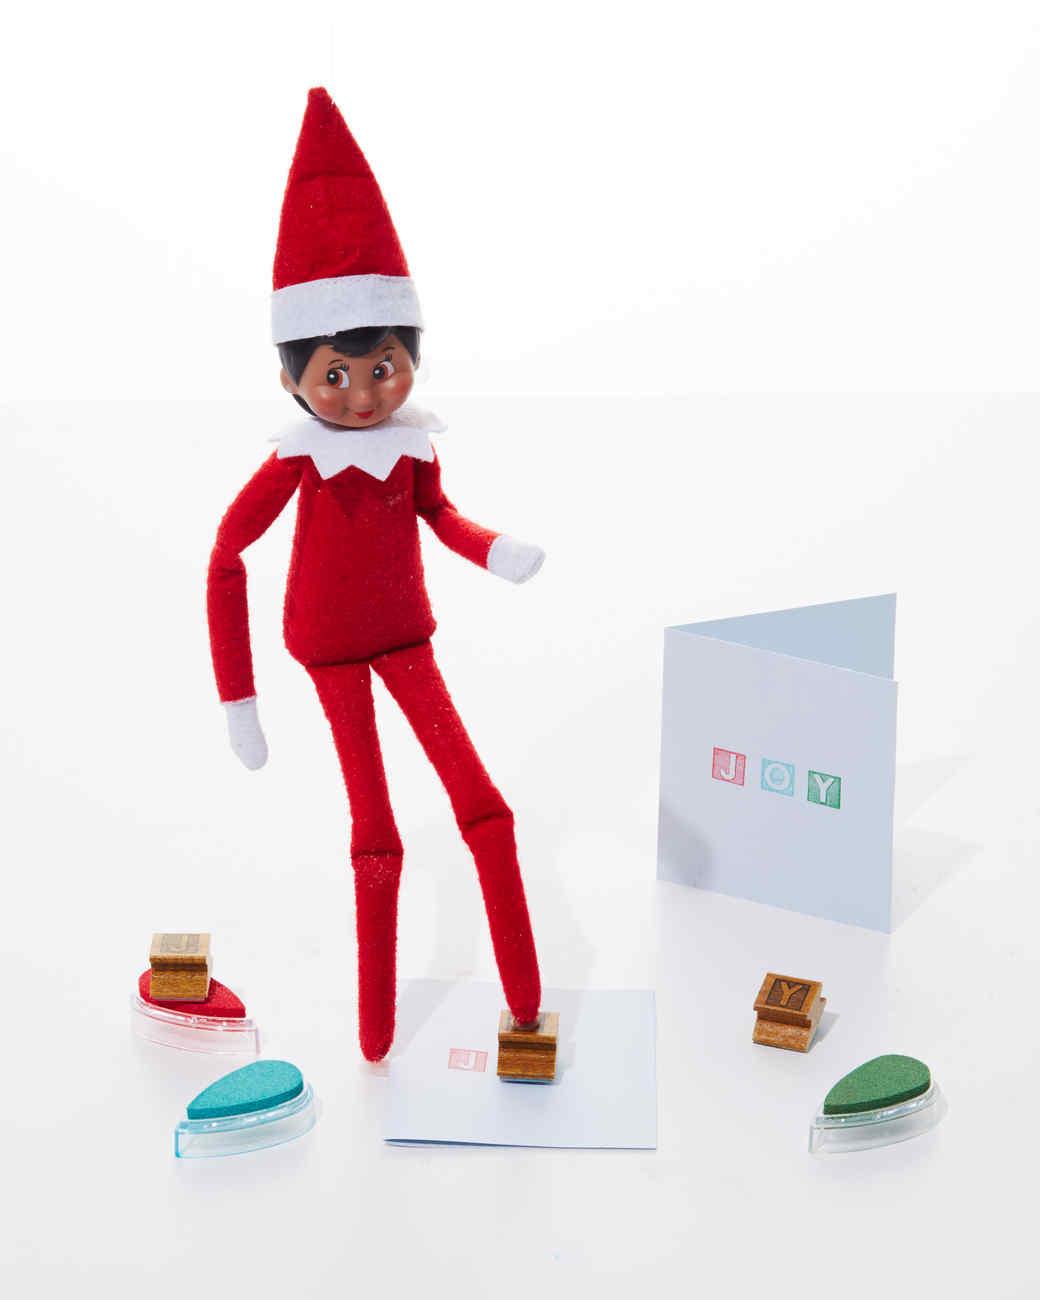 elf-on-shelf-stamping-0263-d112640-1215.jpg